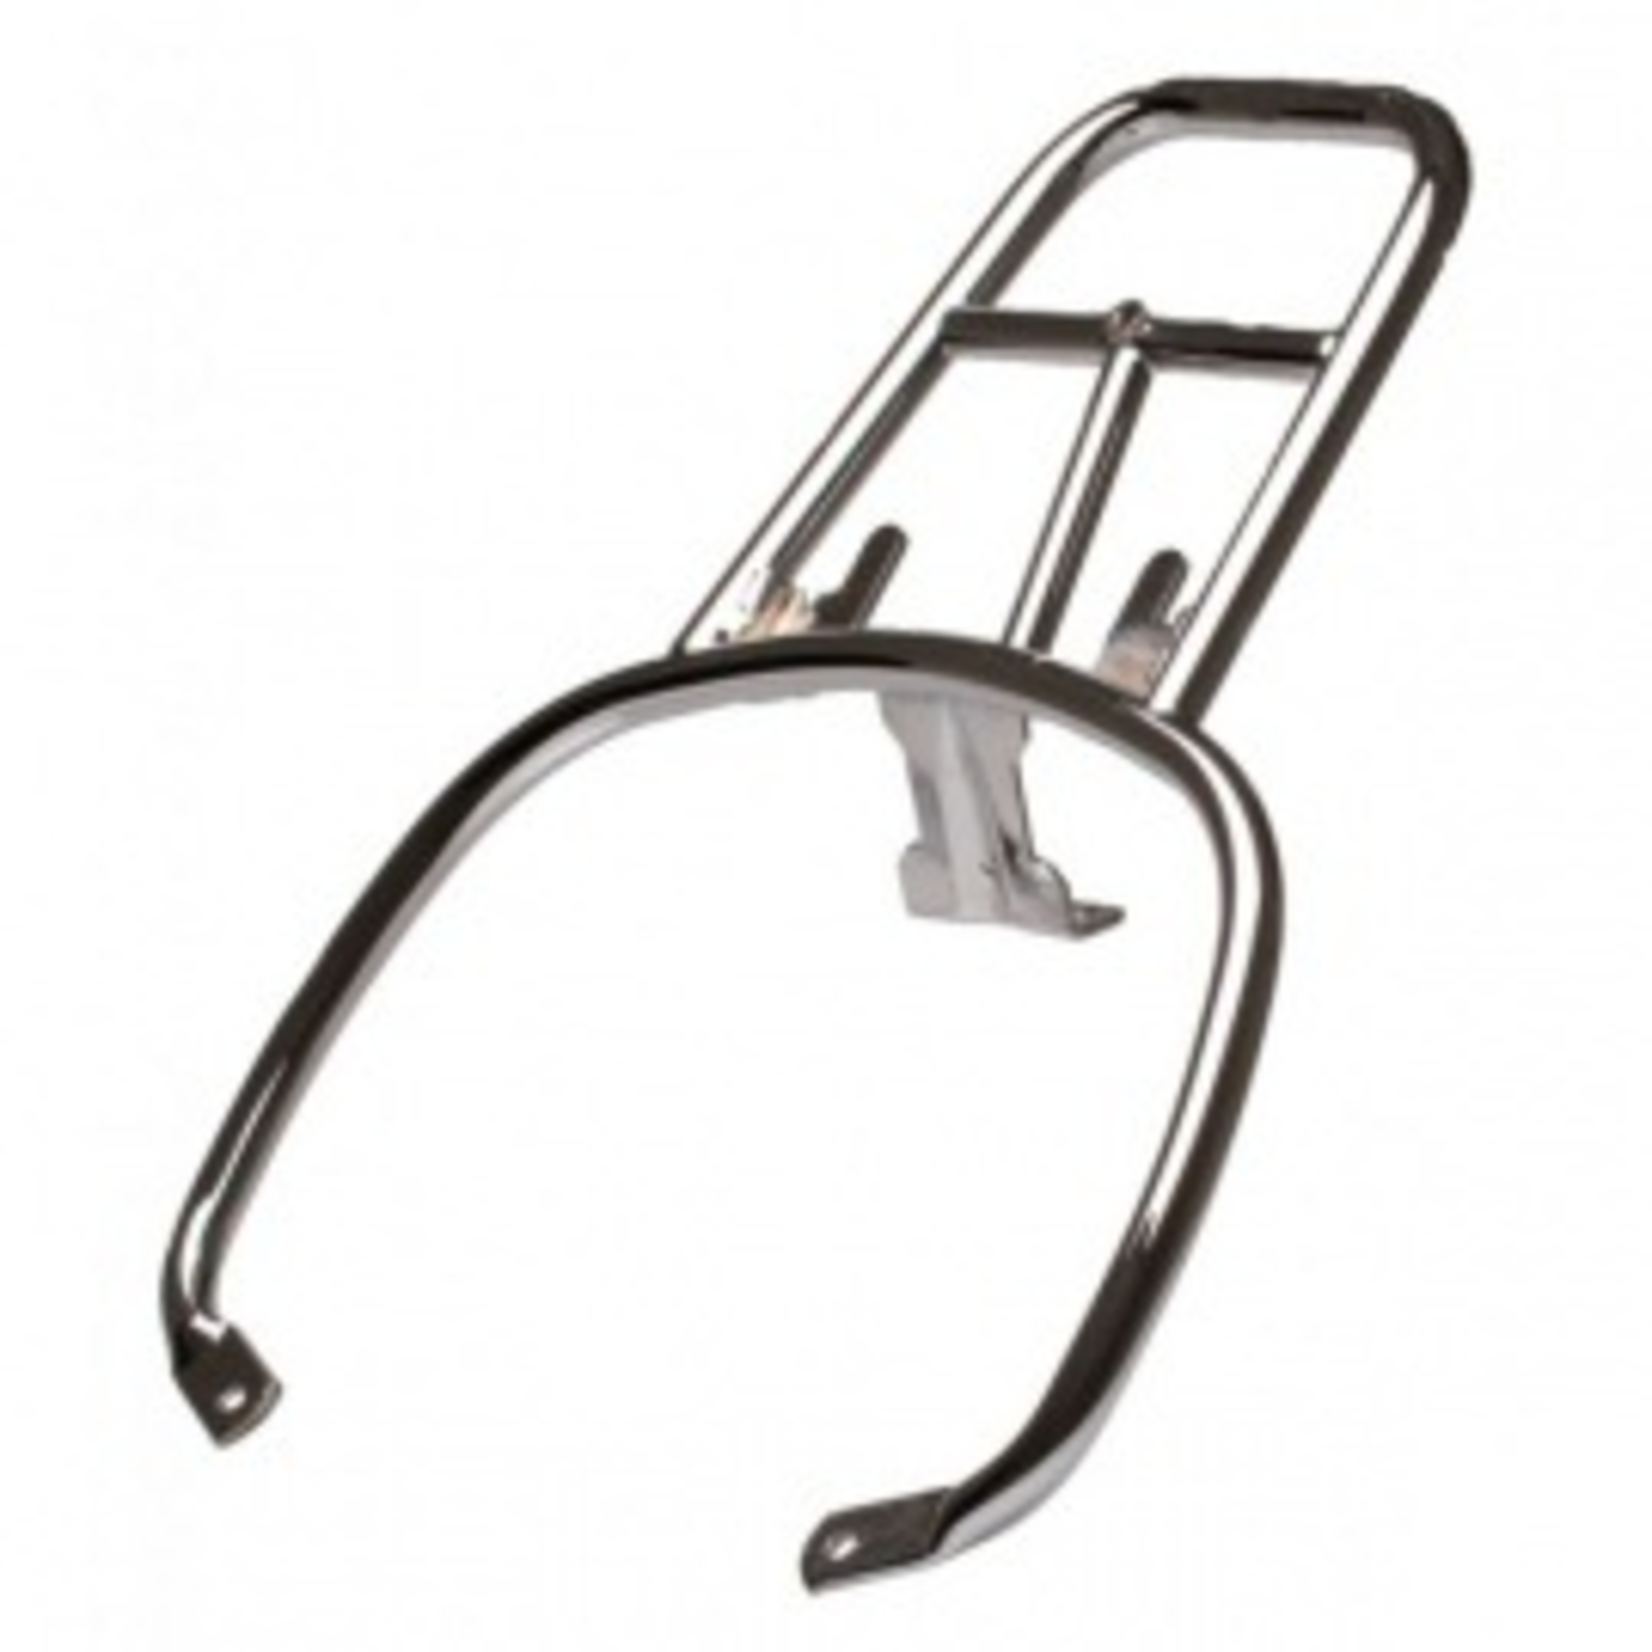 Accessories Top Case Mounting Rack, Primavera/Sprint Chrome